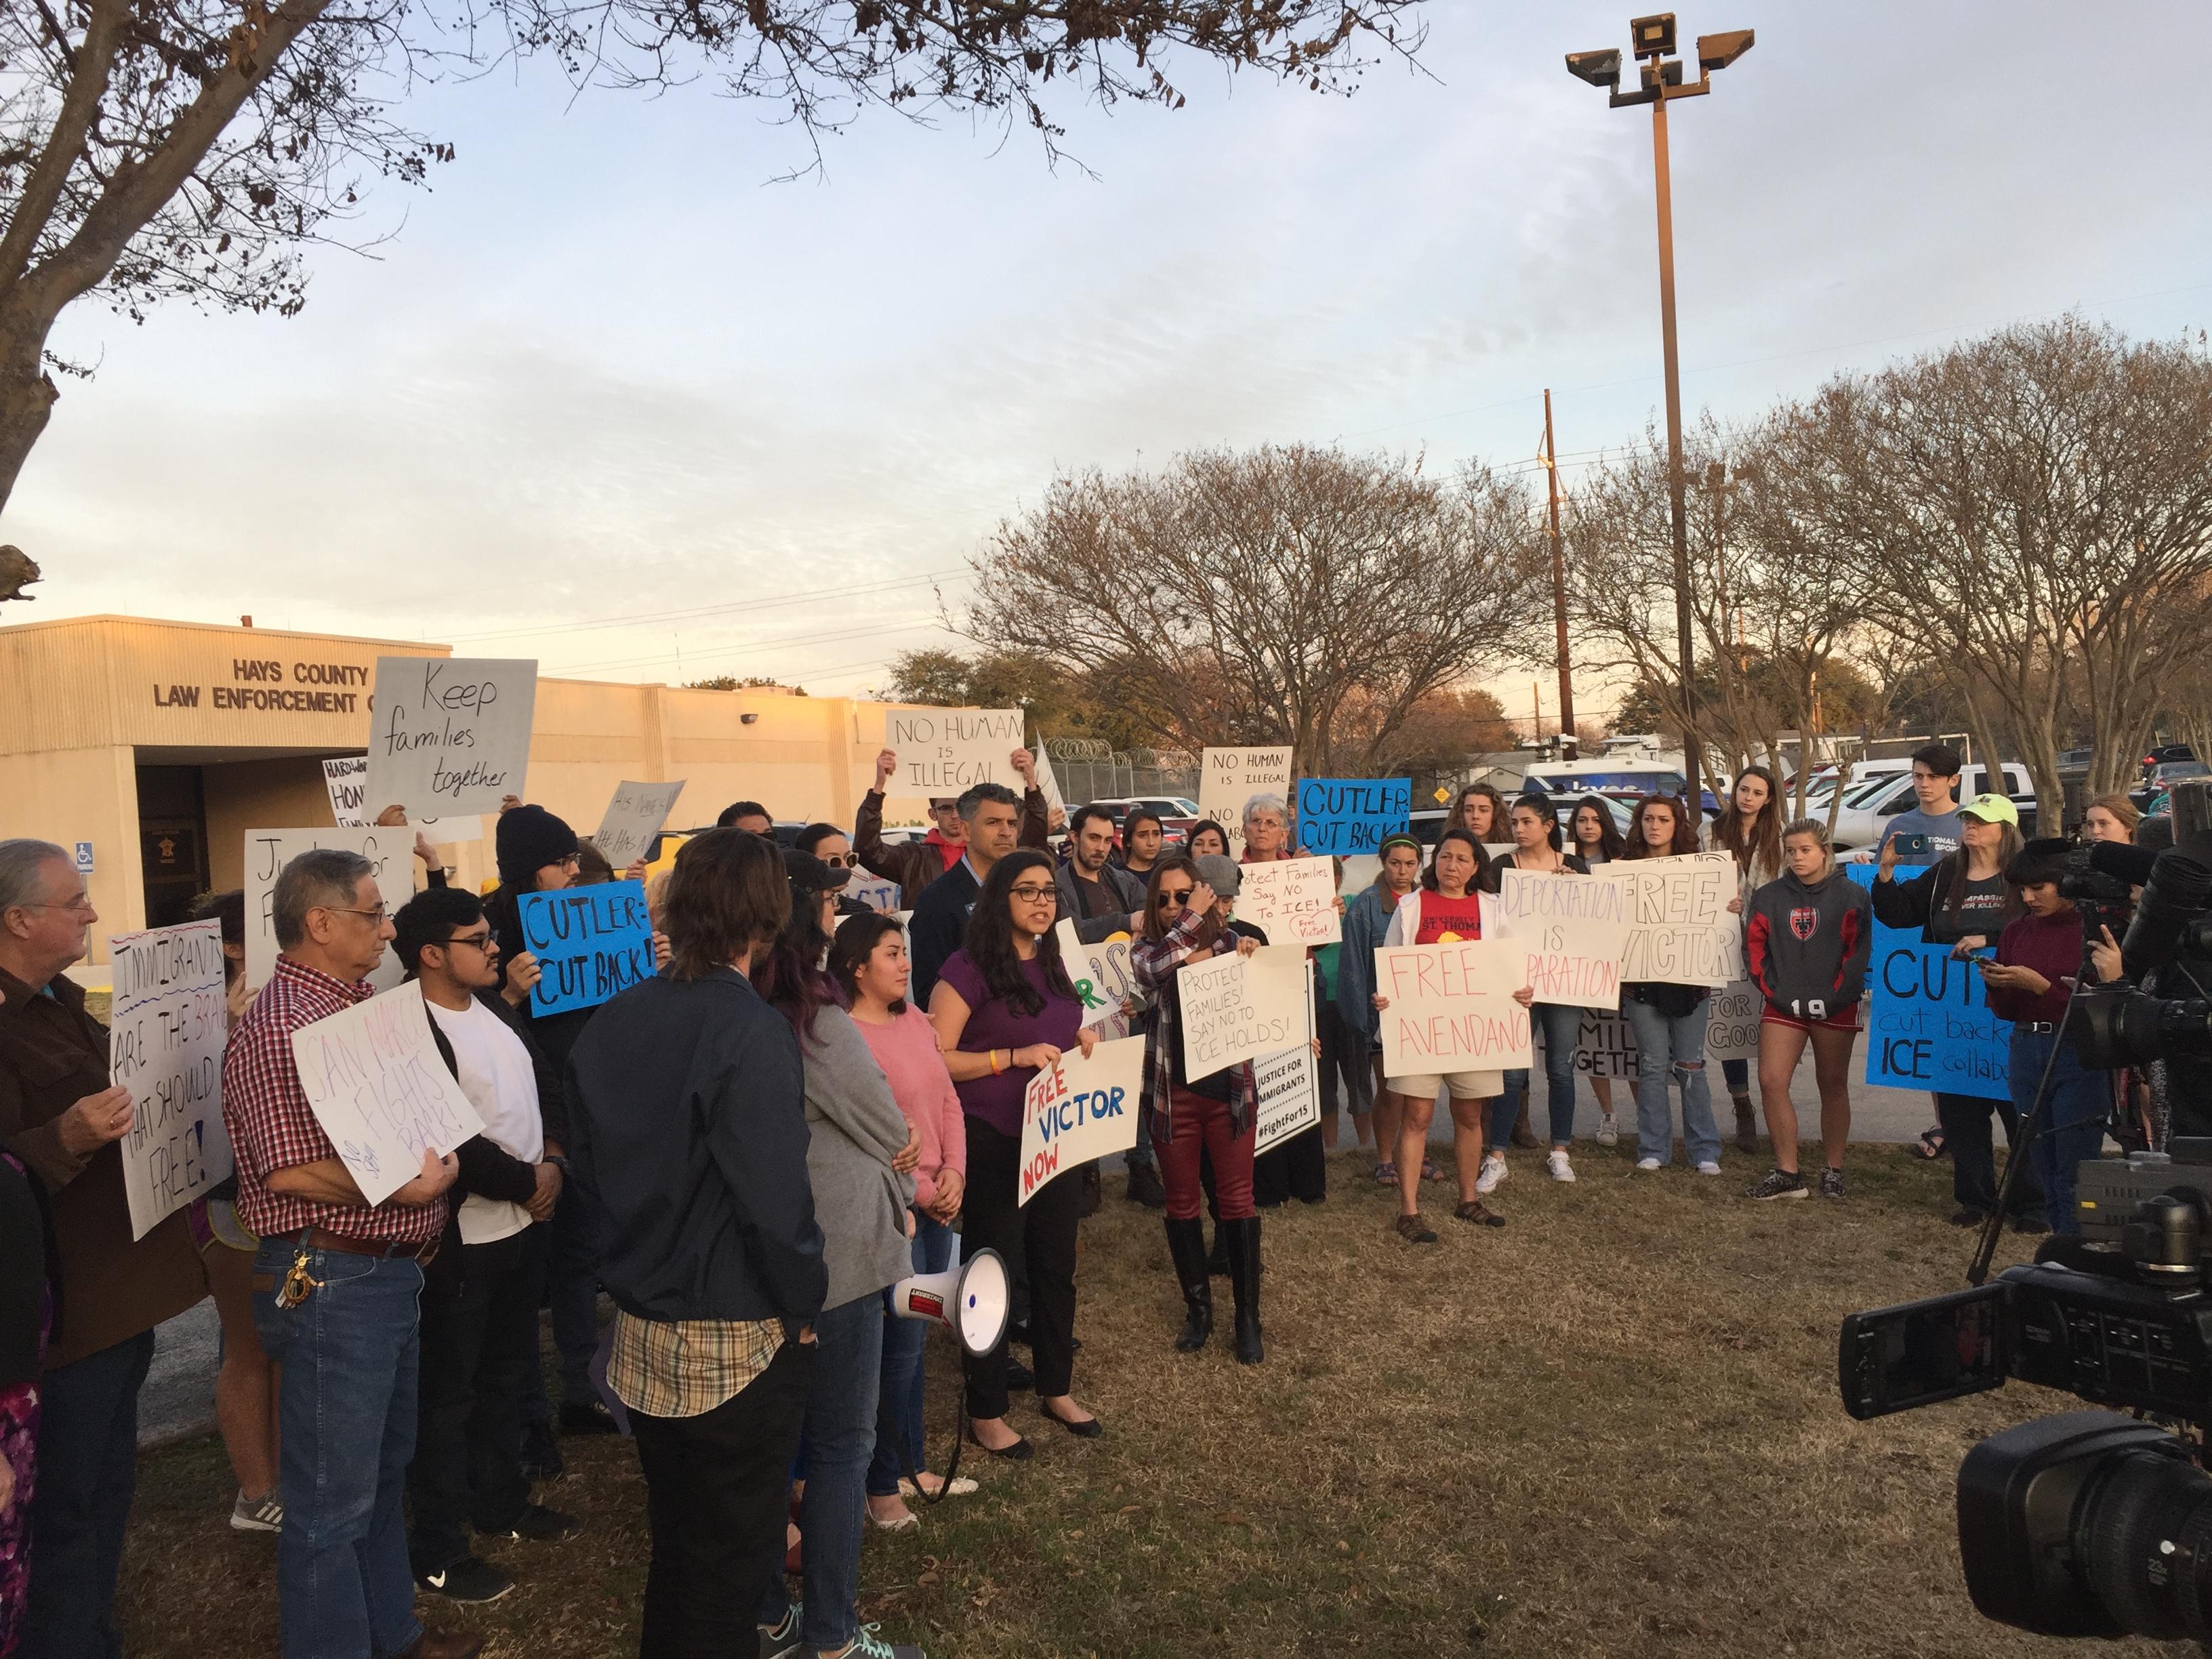 Families, friends and advocacy groups rally for Victor Alejandro Avendano-Ramirez on Jan. 31, 2018. (KXAN Photo/Sean Farrar)